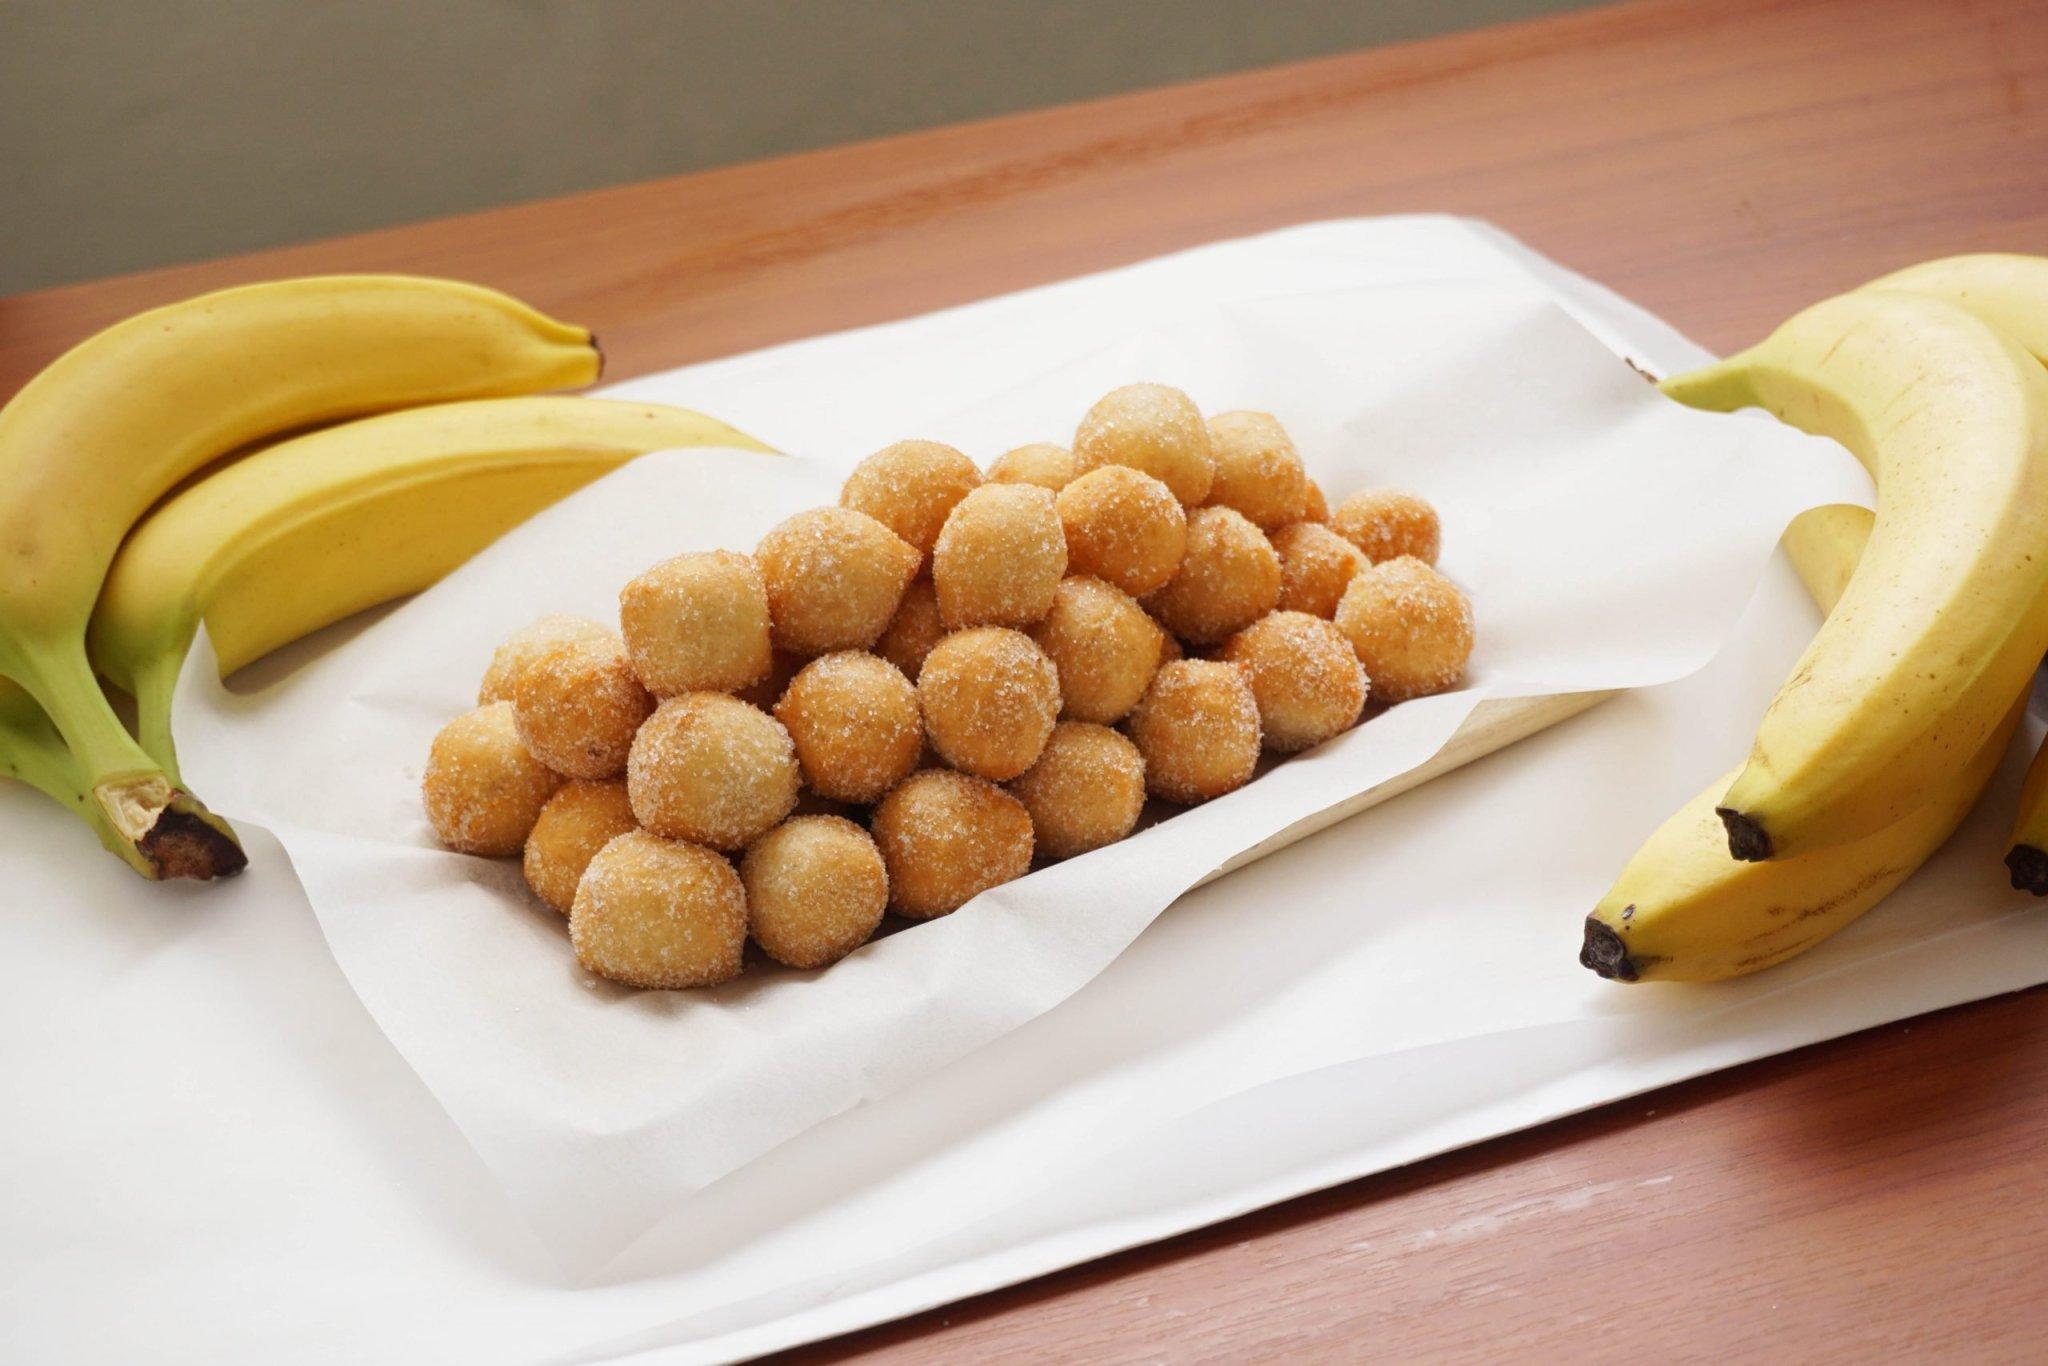 Mmmm...10-Minute Banana Bread Donuts